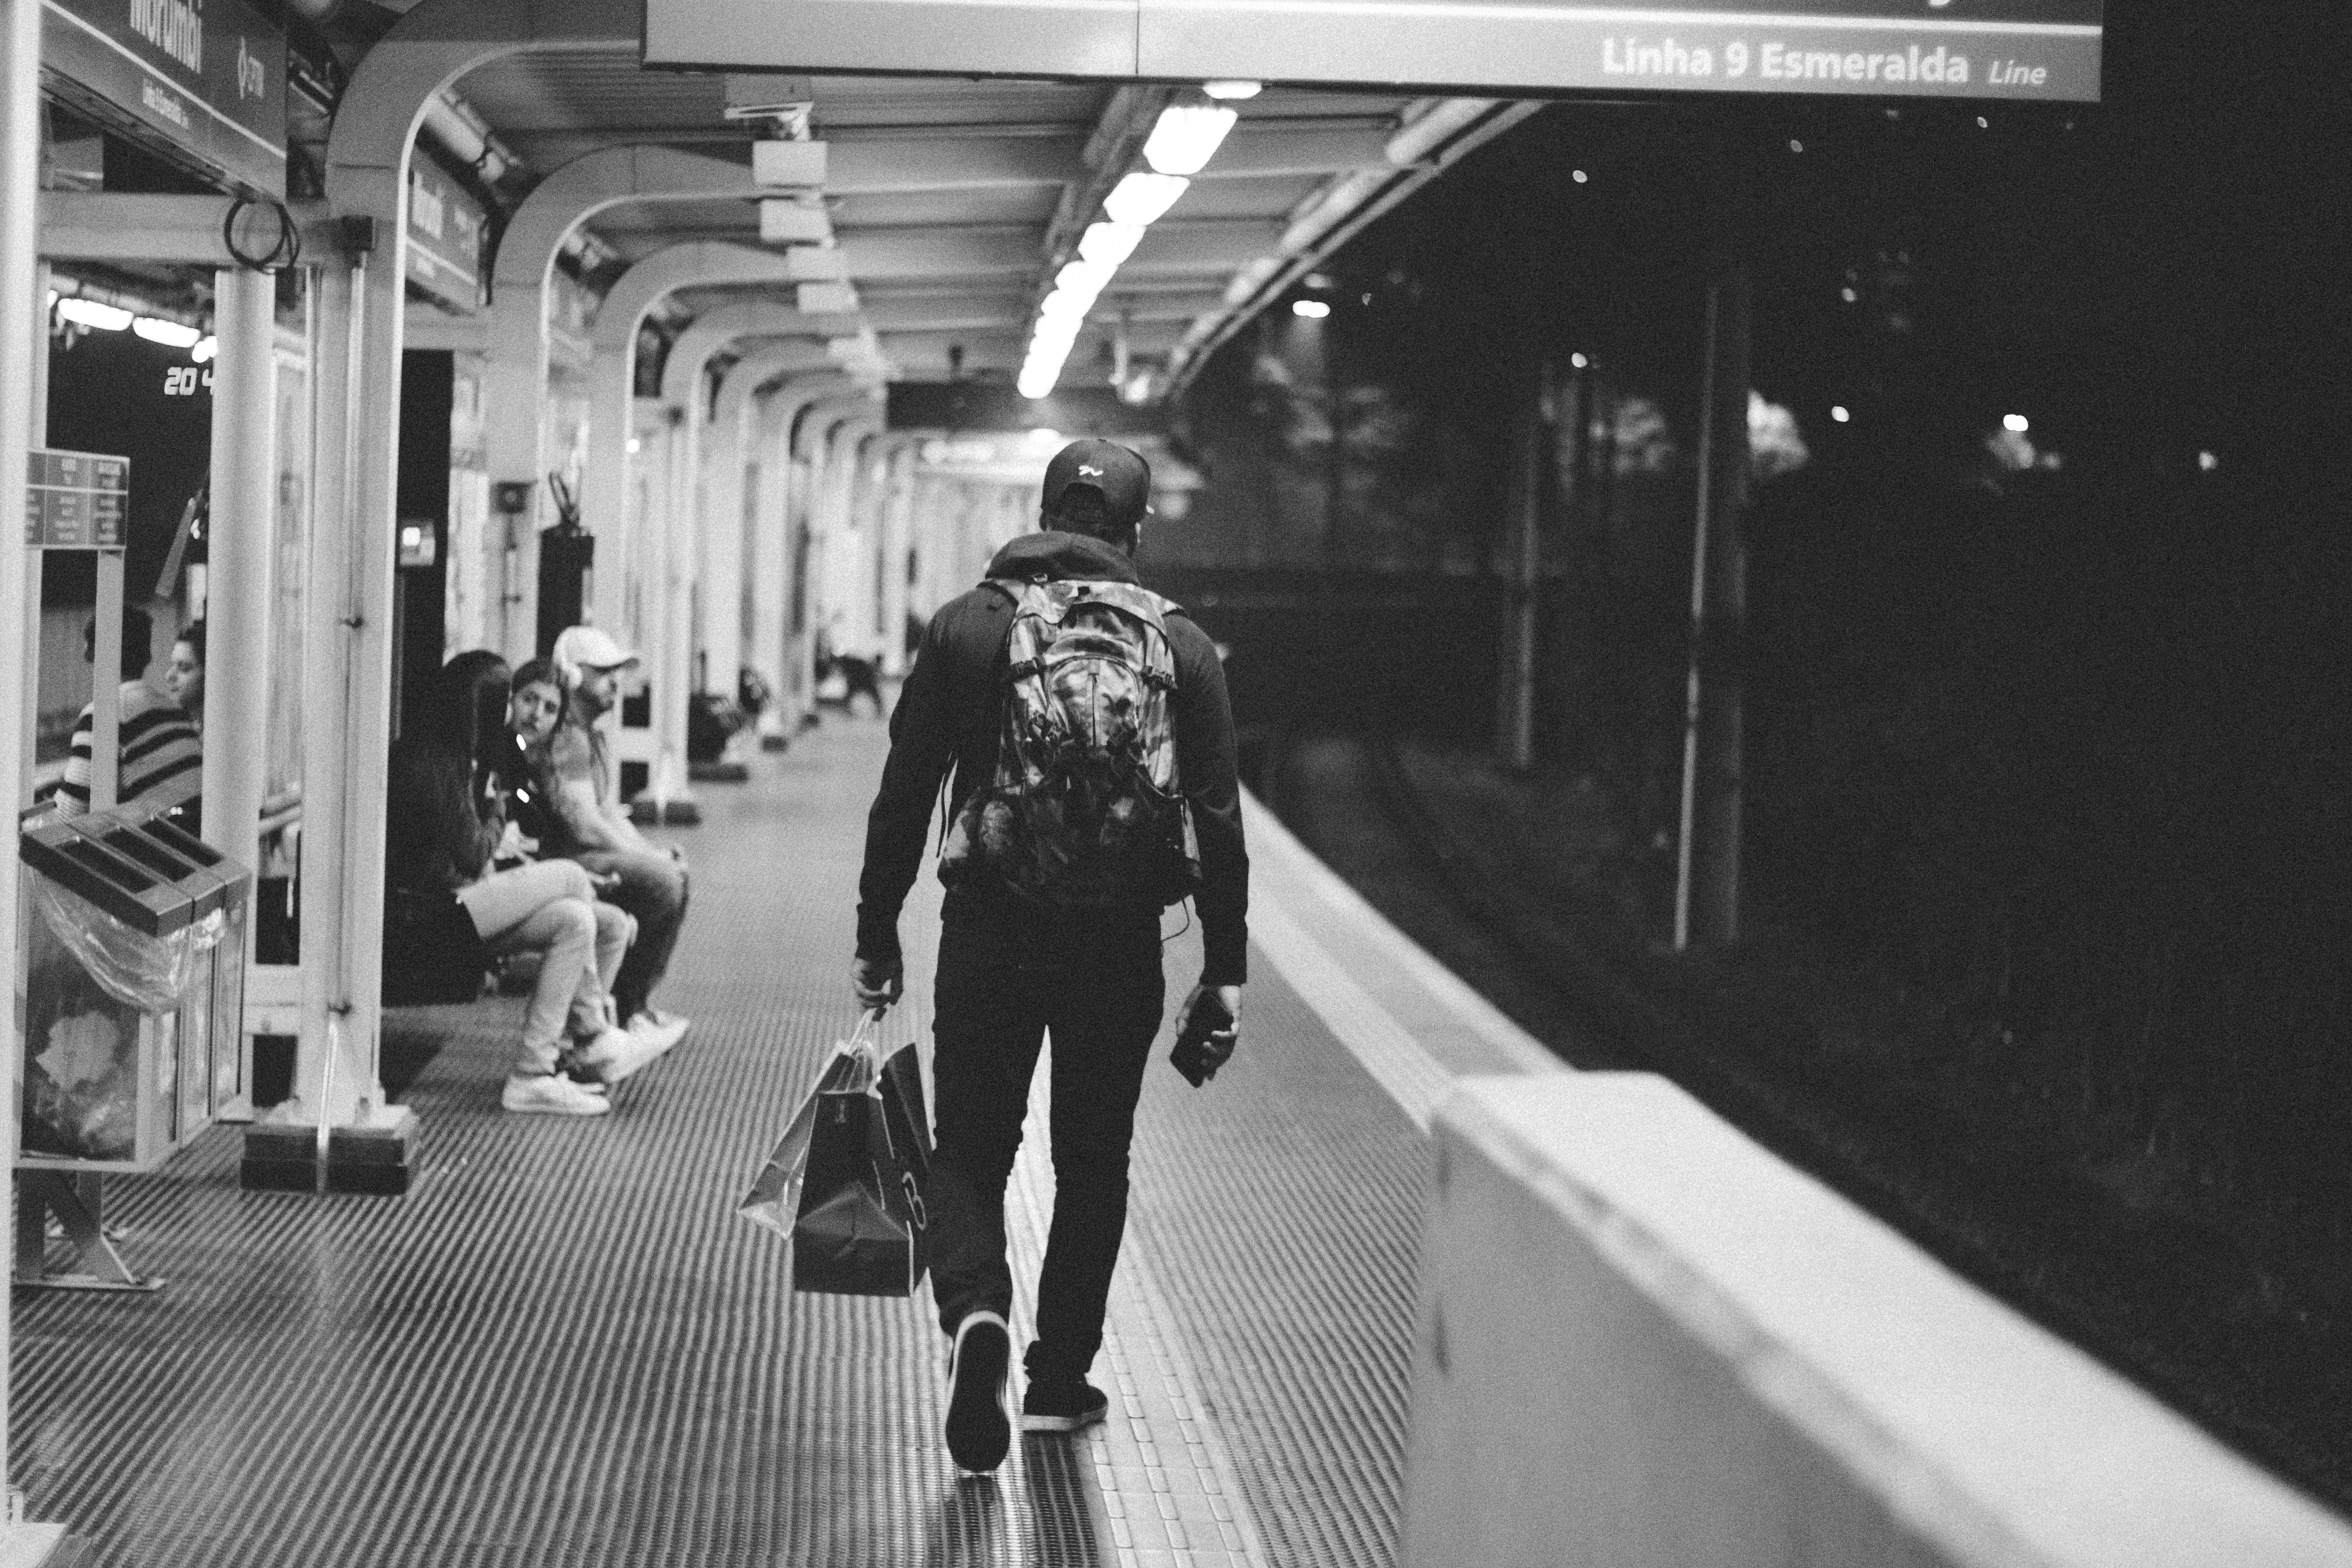 Black and white structure people photography subway metro train station black room monochrome public transportation public